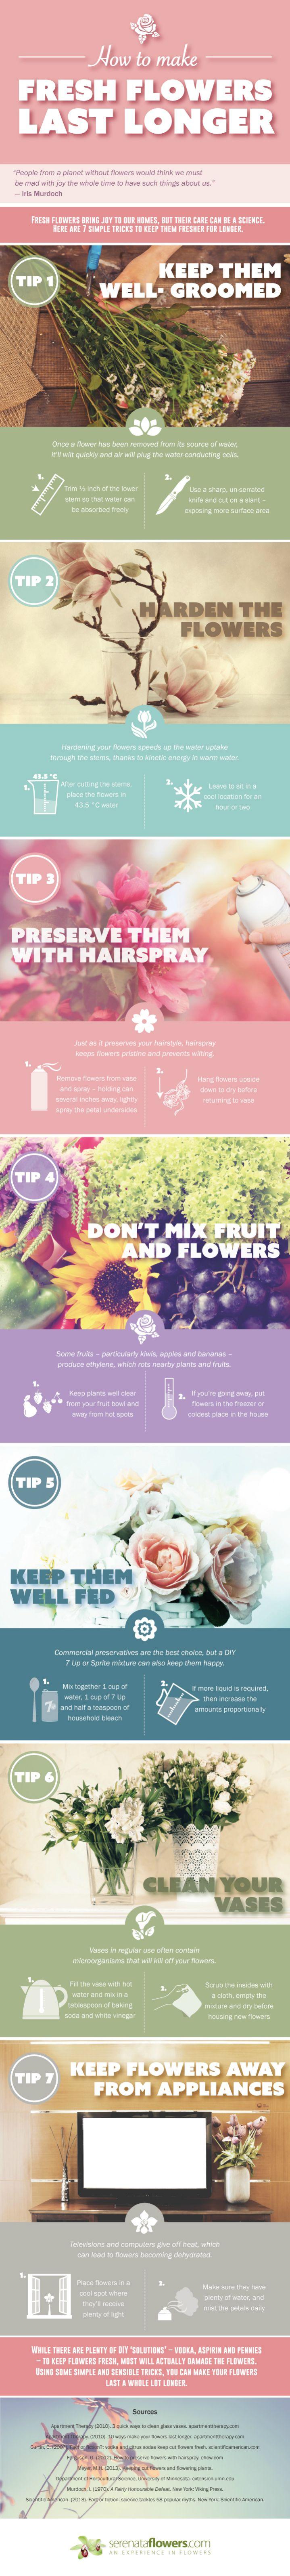 How to make fresh flowers last longer infographic latest how to make fresh flowers last longer infographic howto flowers izmirmasajfo